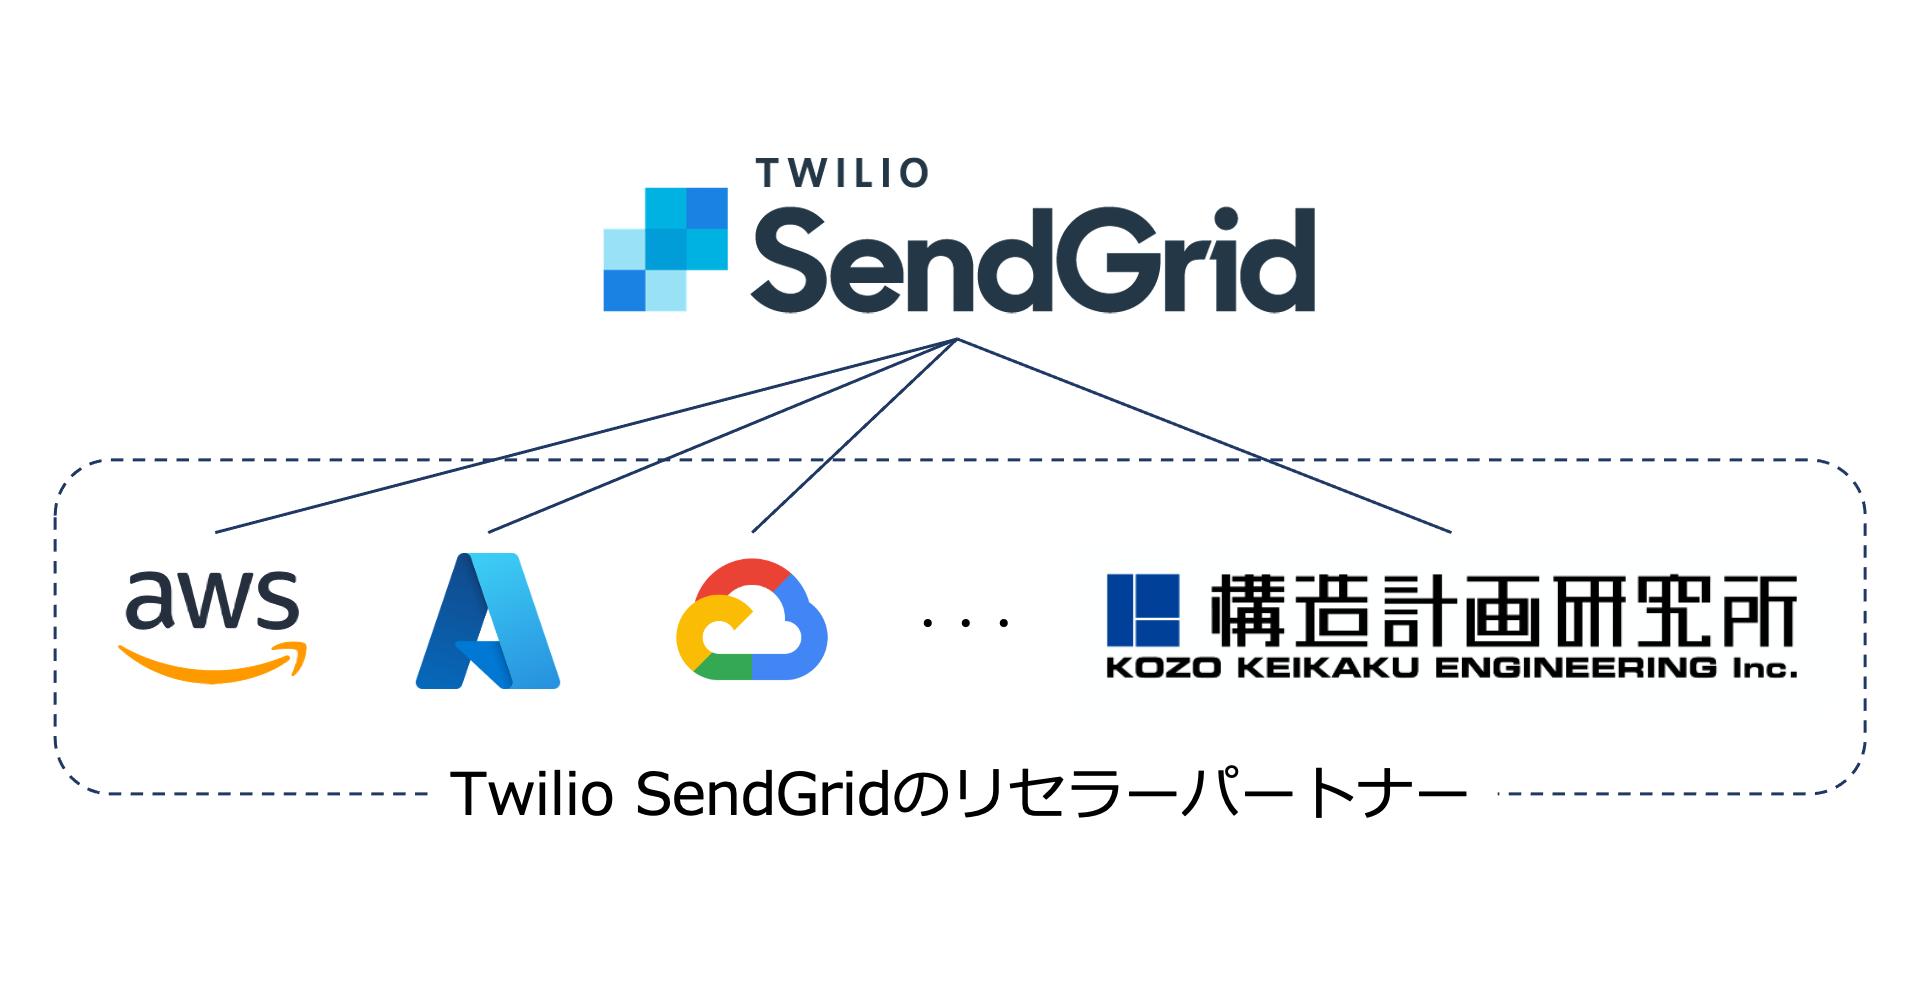 Twilio SendGridのリセラーパートナー